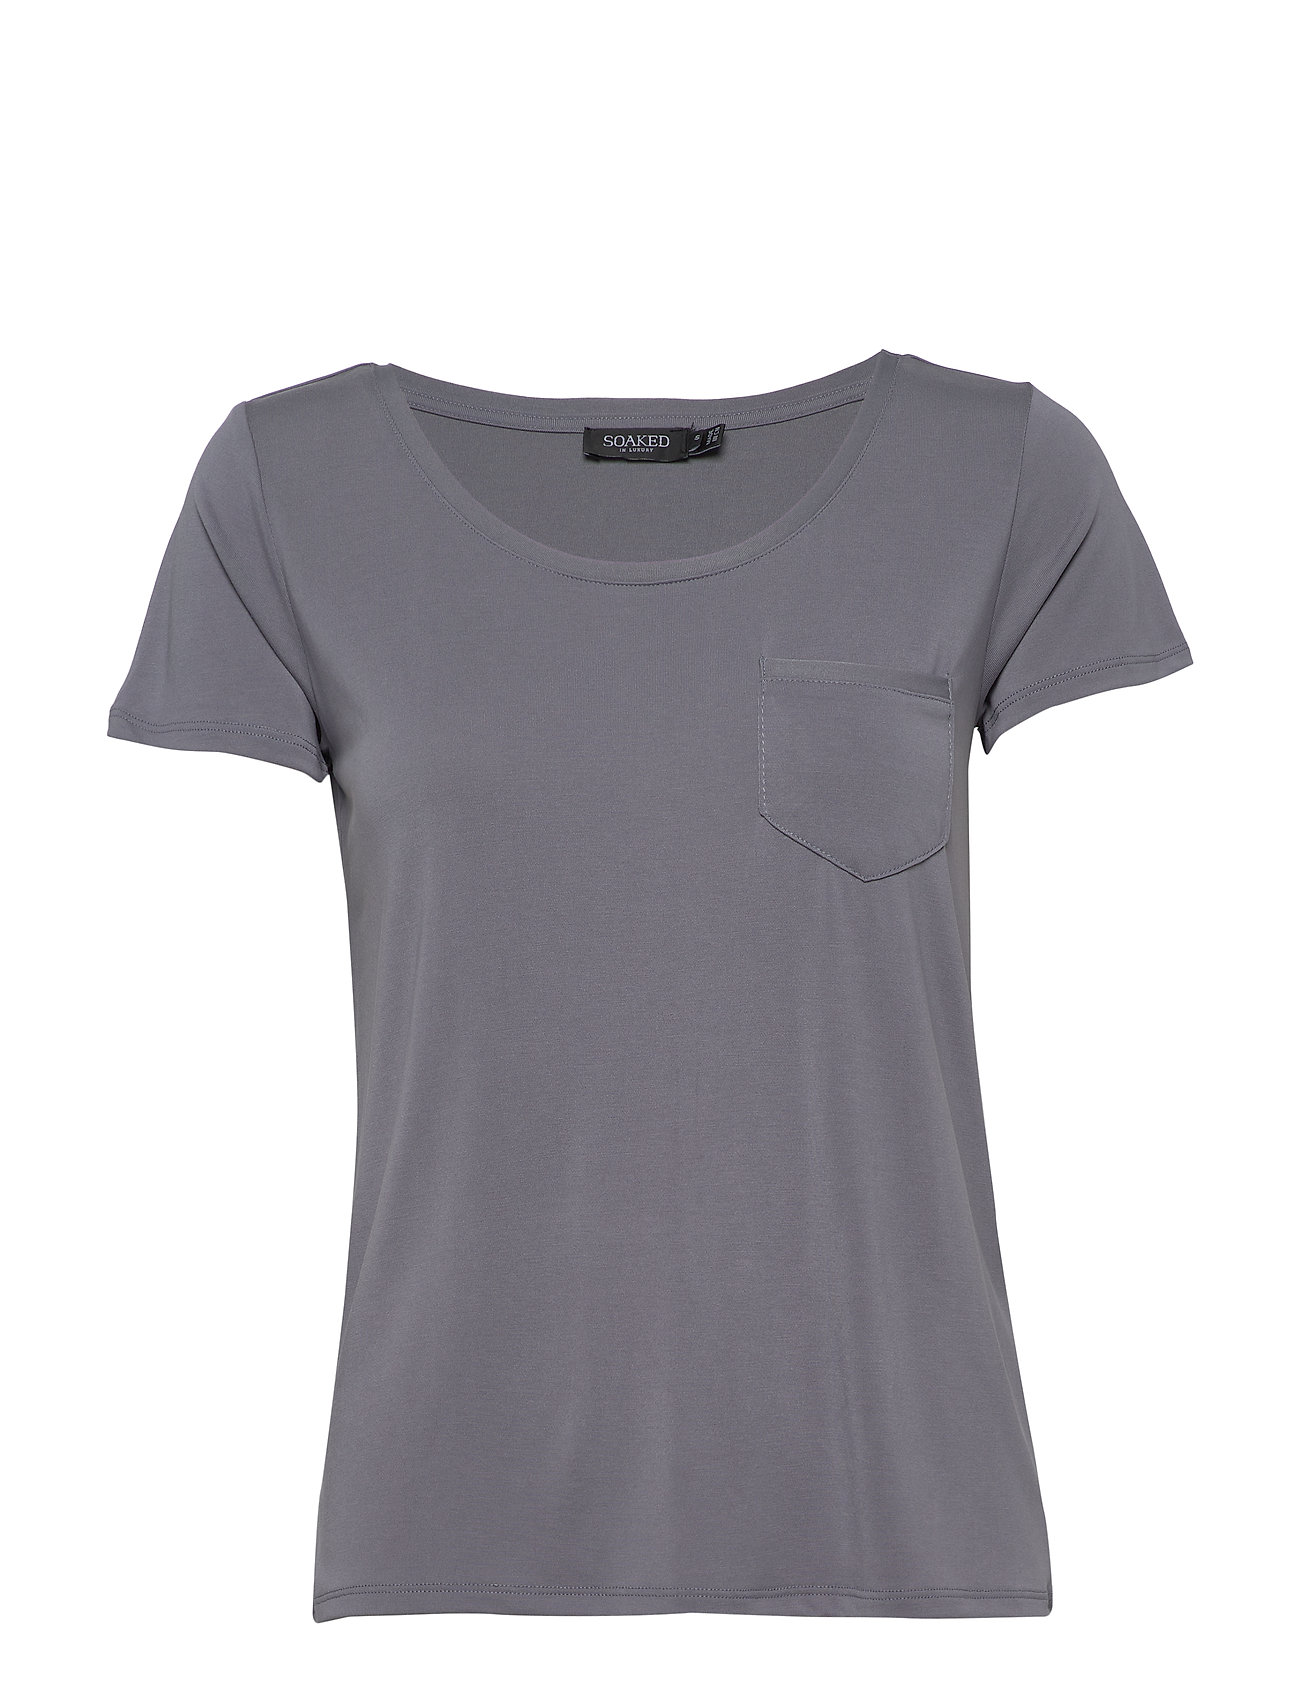 Image of Slcolumbine Tee T-shirt Top Blå Soaked In Luxury (3425610717)